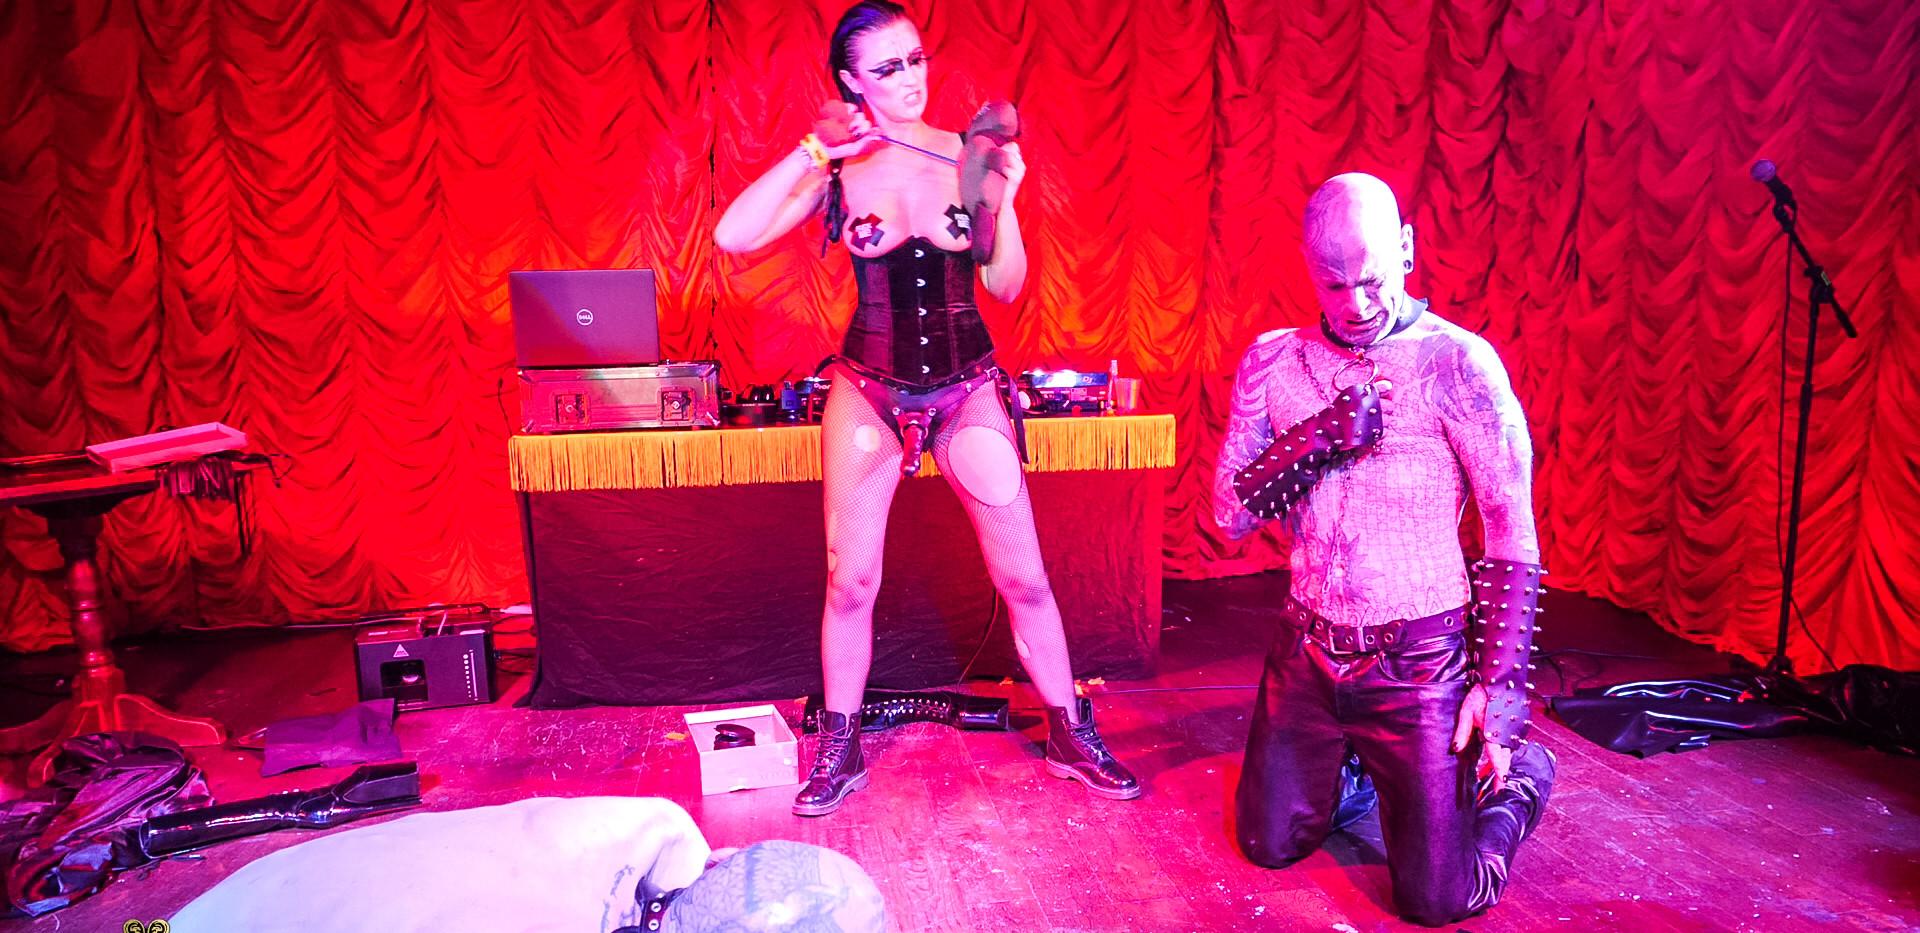 Cabaret of Excess - 152.jpg